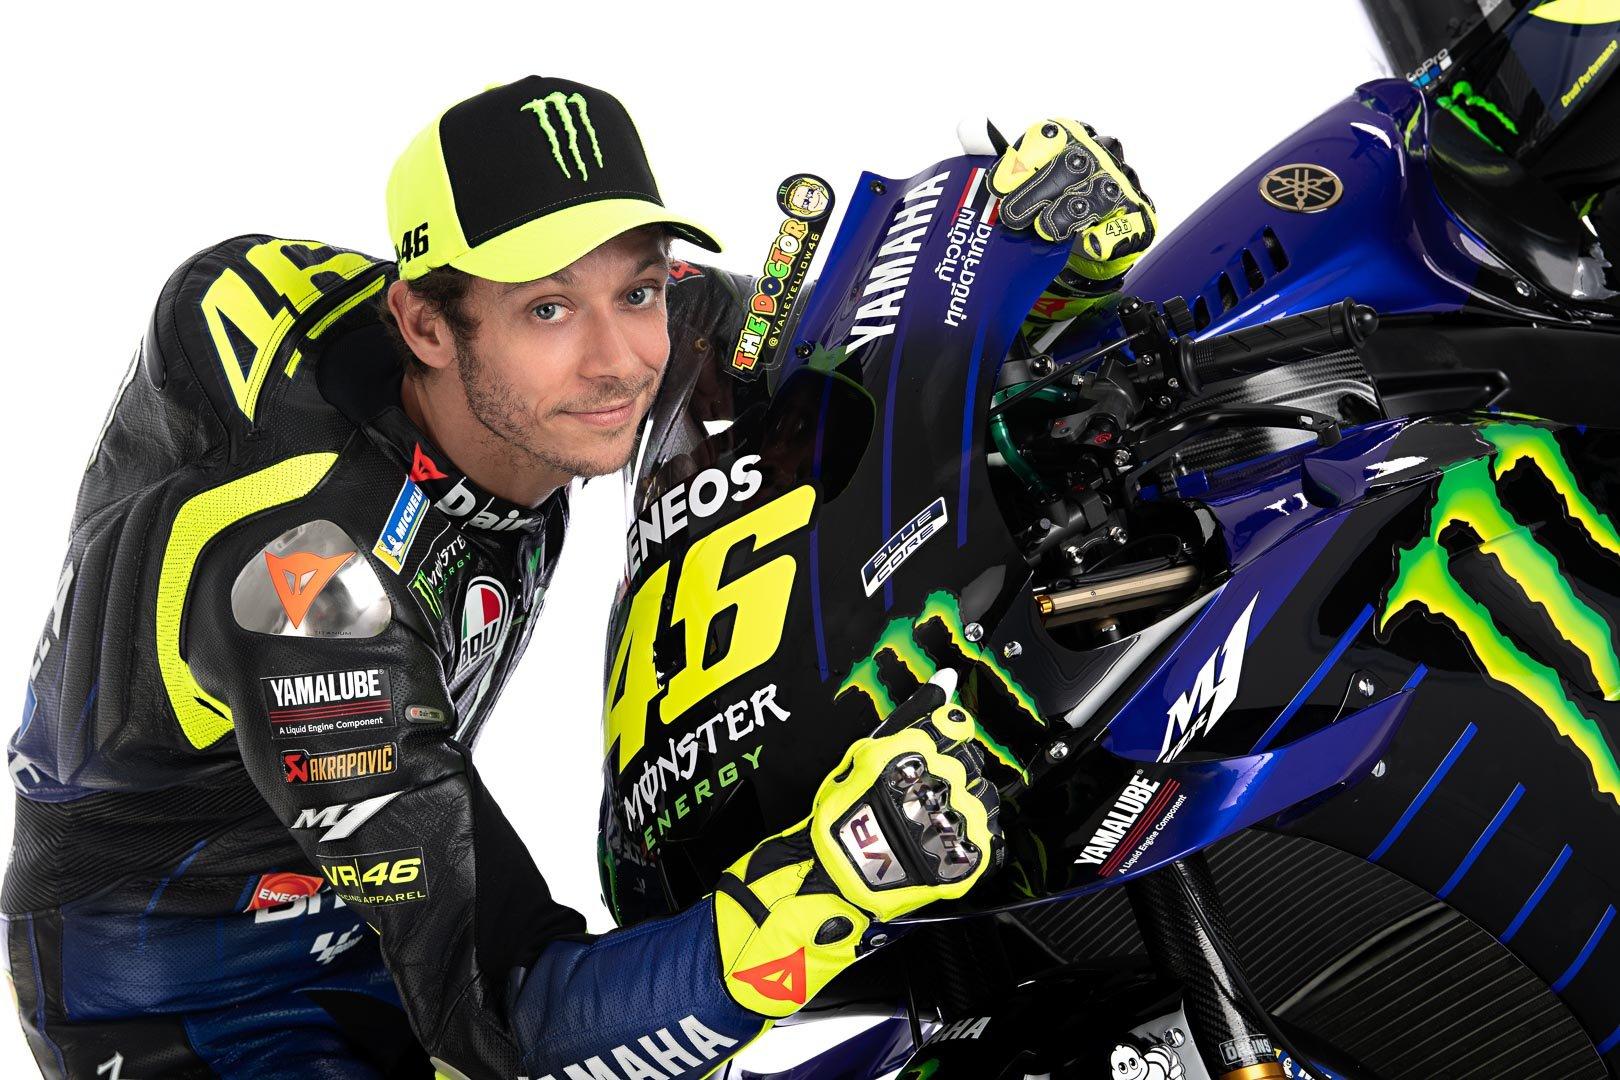 Valentino Rossi 2020 Motogp Yamaha Livery First Look 18 Photos